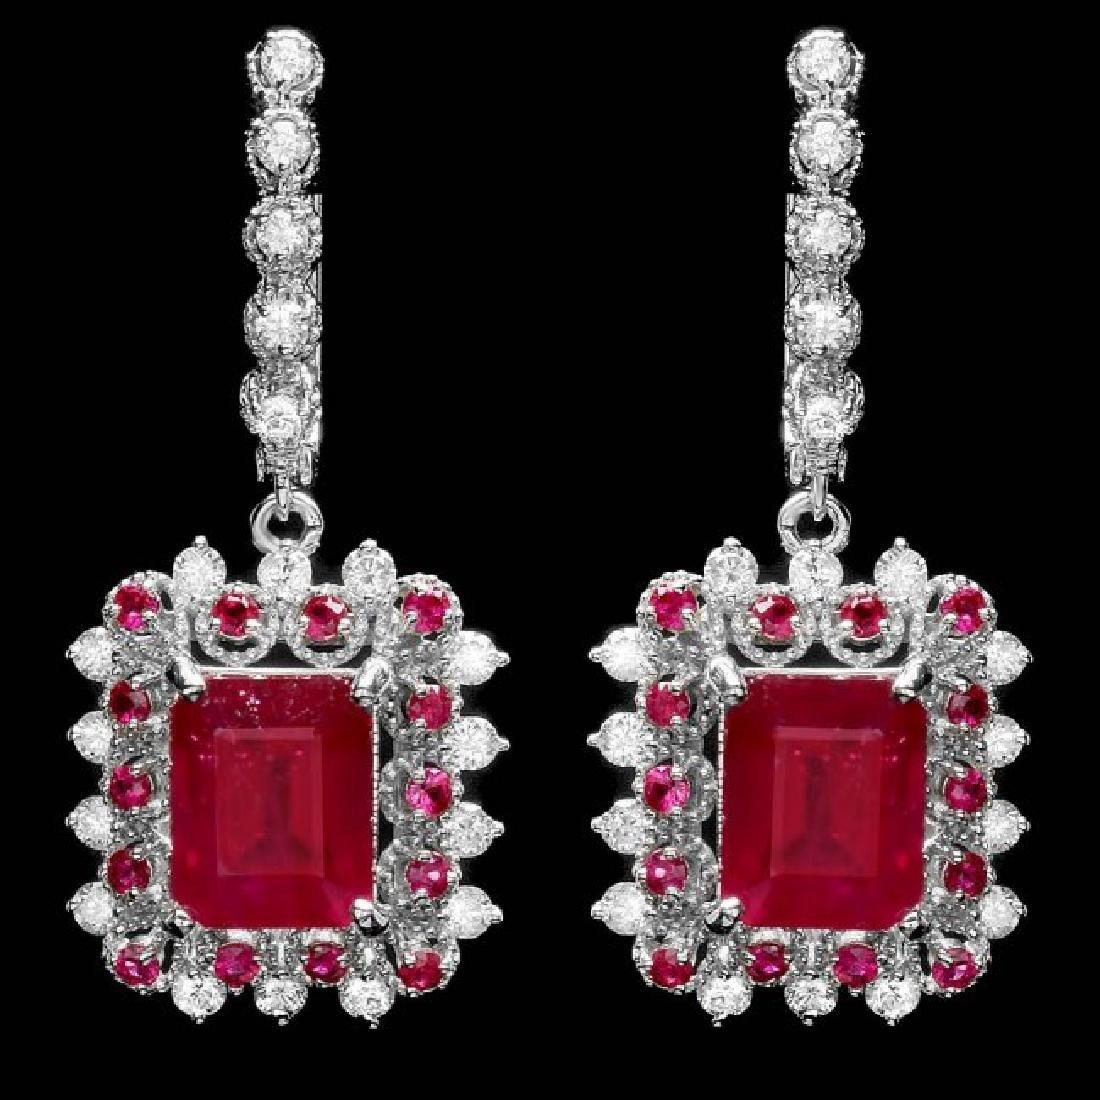 14k Gold 11.4ct Ruby 1.50ct Diamond Earrings